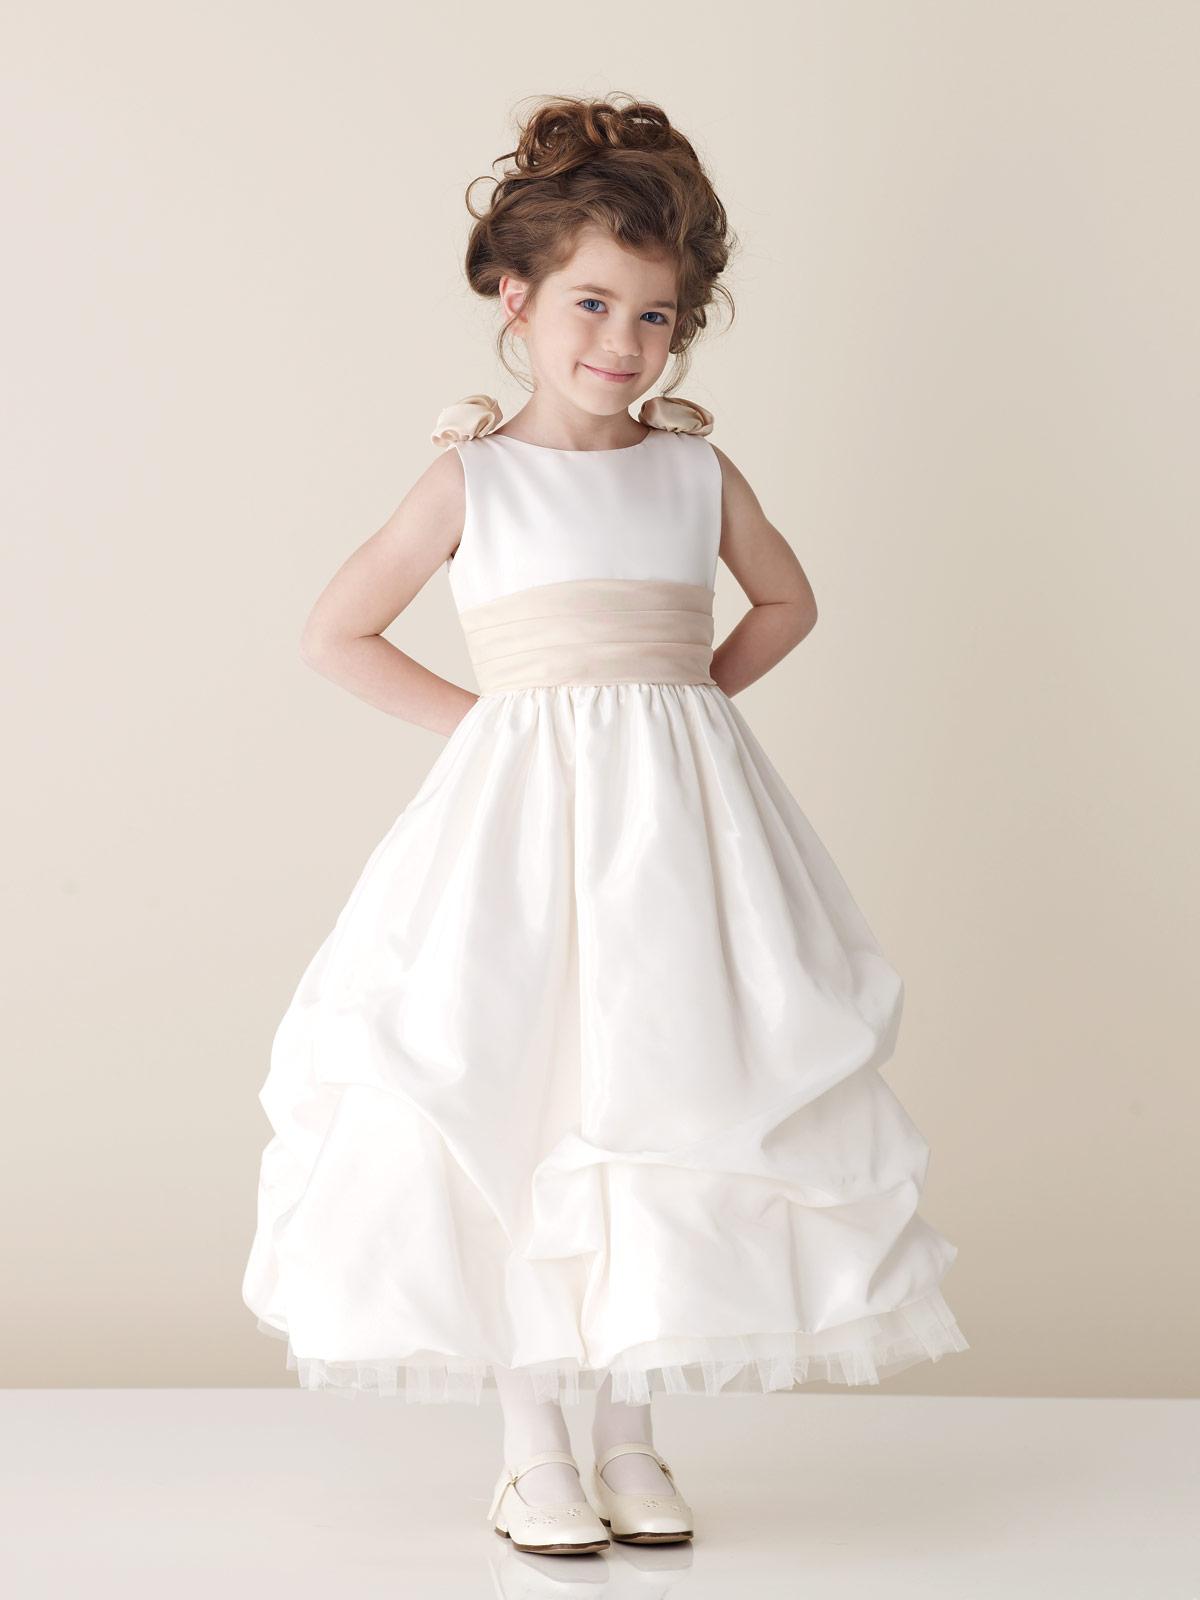 Ideas Evening Wedding Dresses For Junior | Wedding Dress Styles